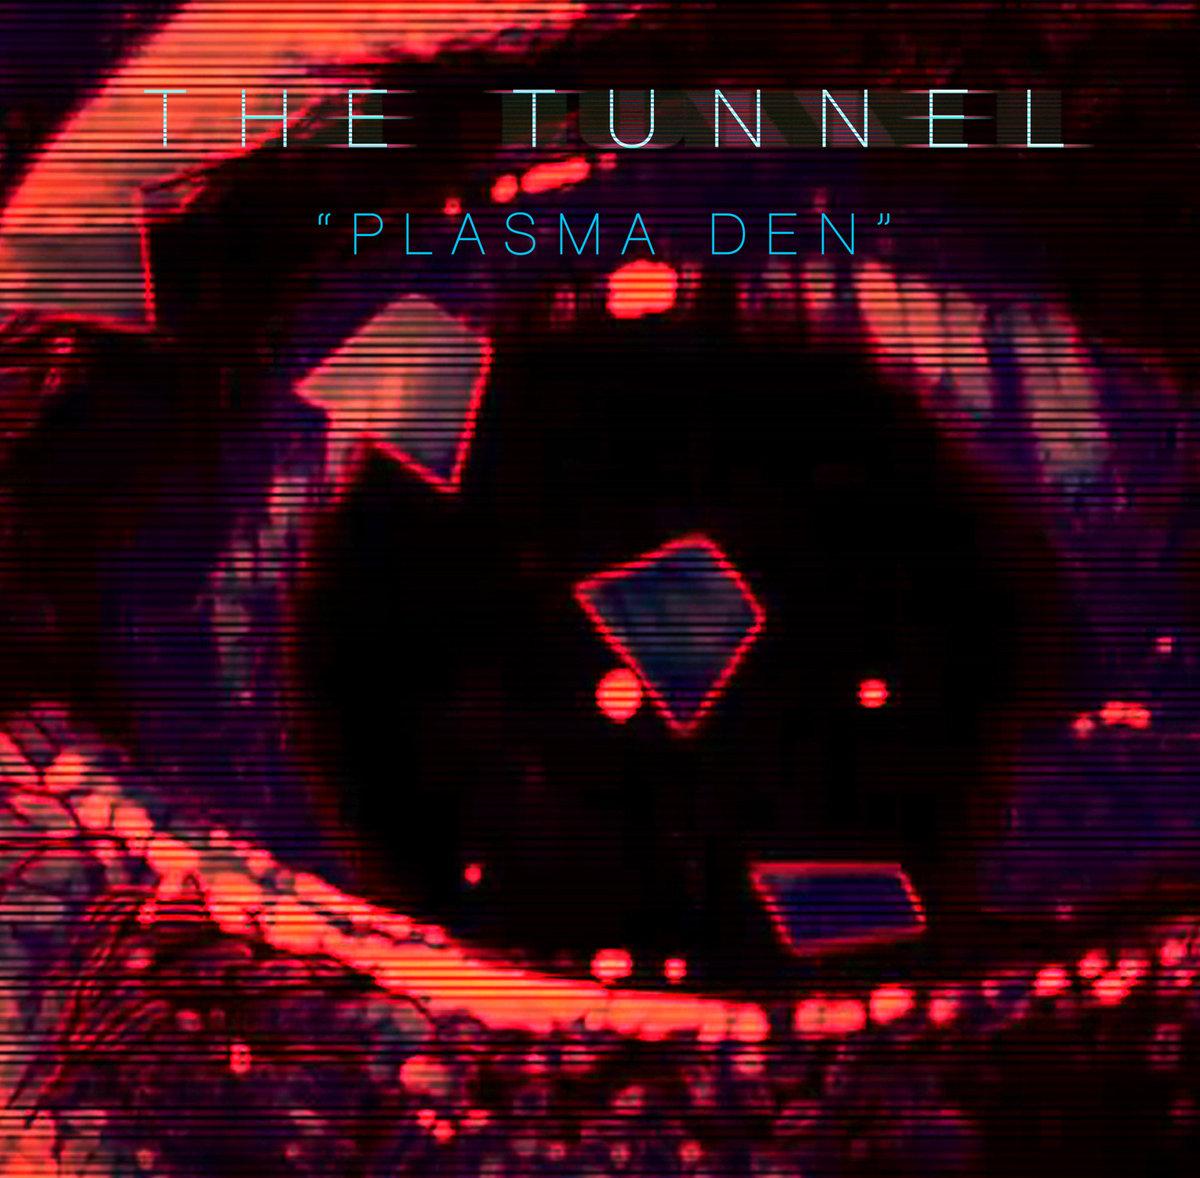 tunnelplasma.jpg